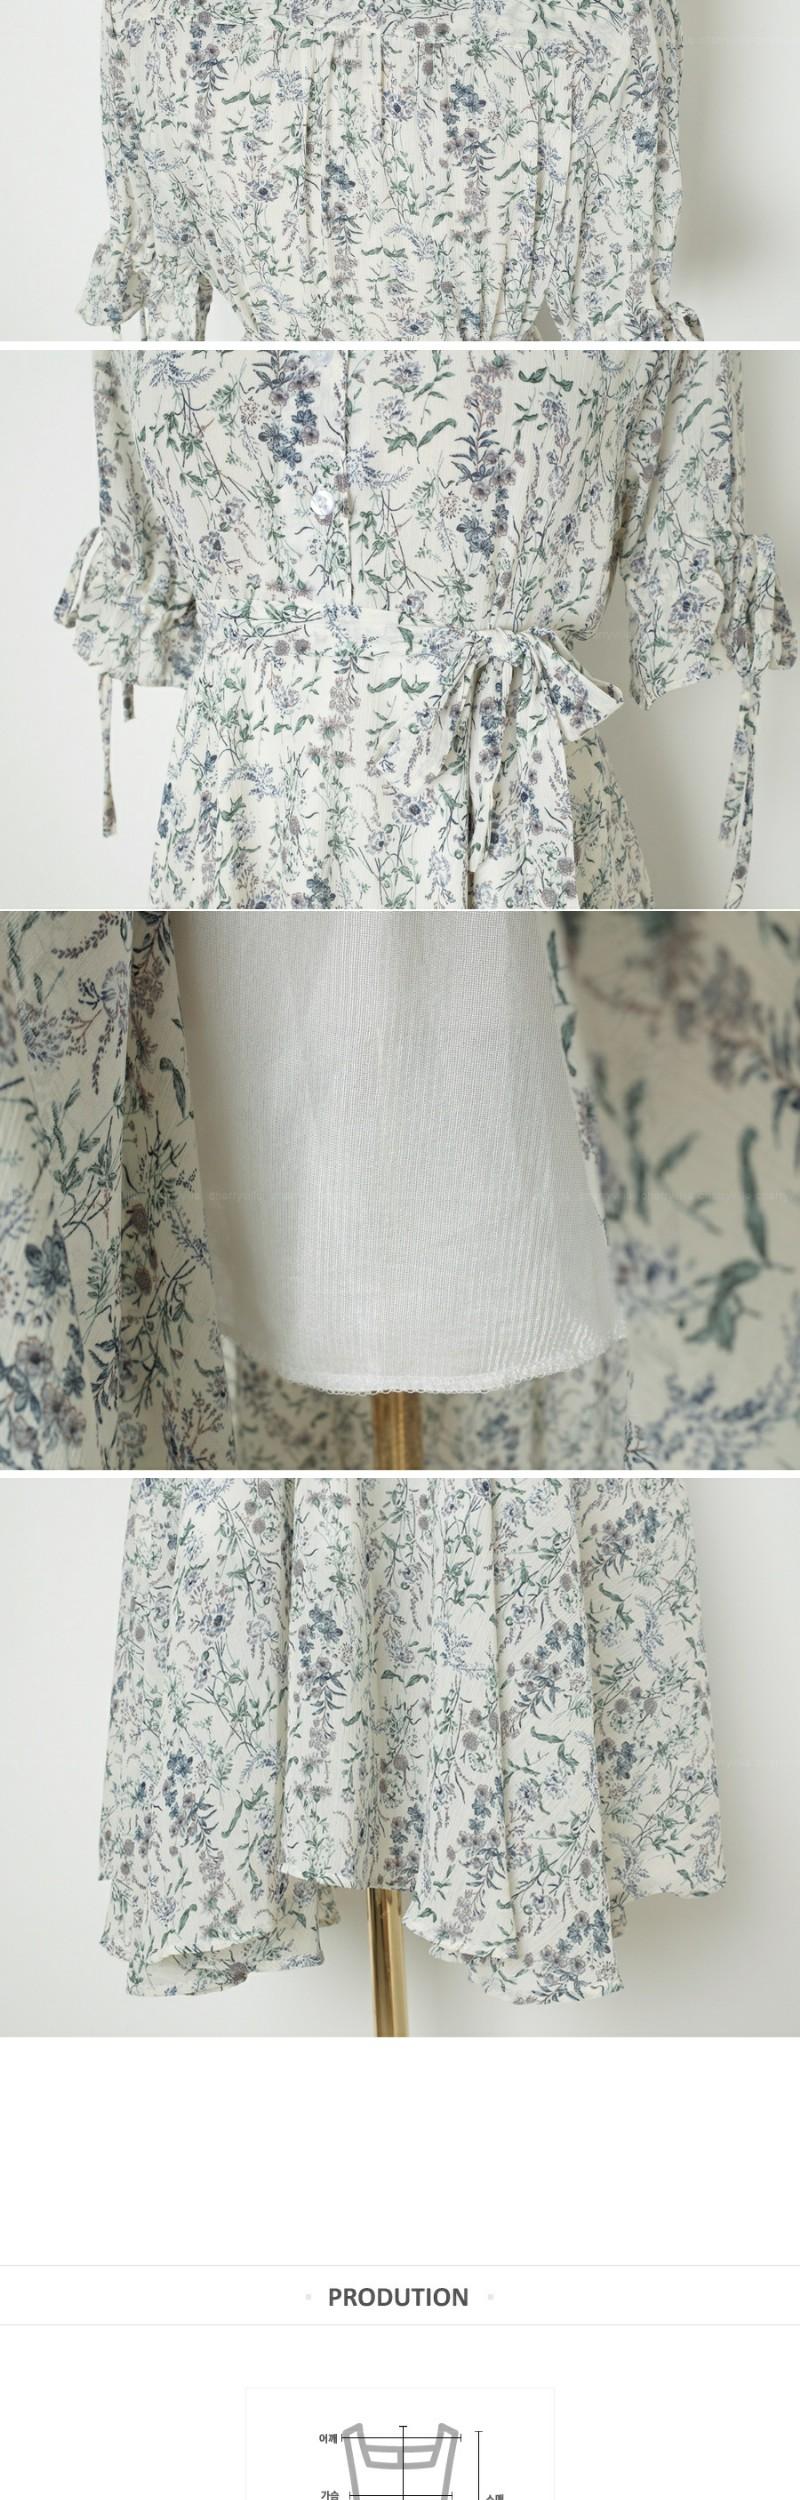 Cheerful V-wrap dress